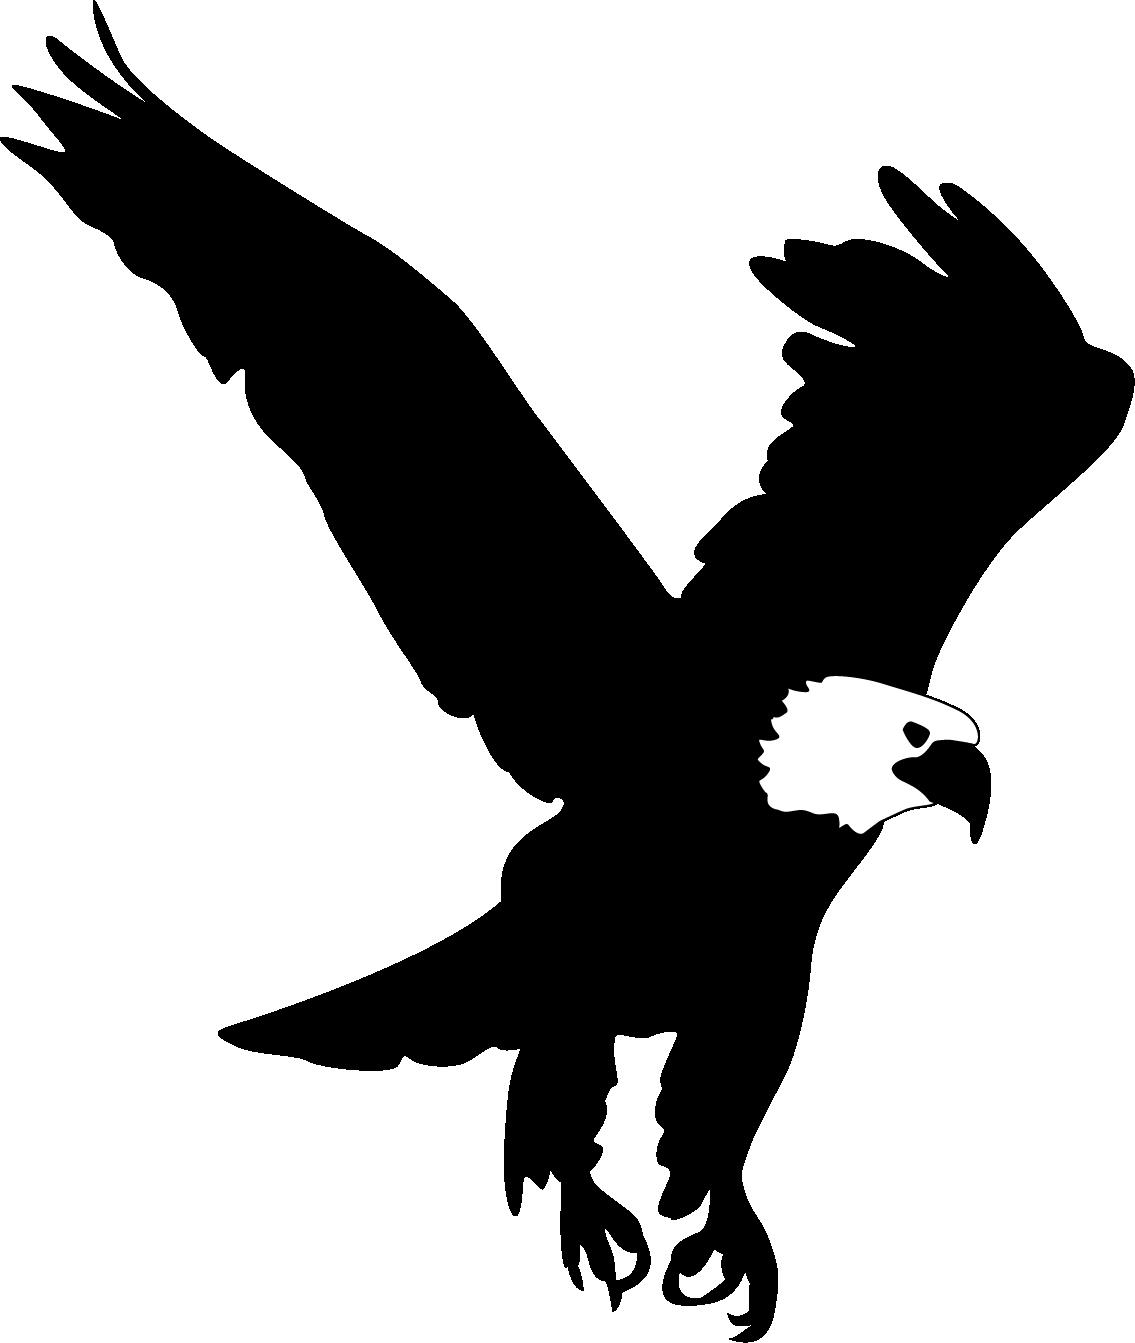 Bald Eagle Clip art - Eagle wings png download - 1135*1343 ... - Eagle Face Silhouette